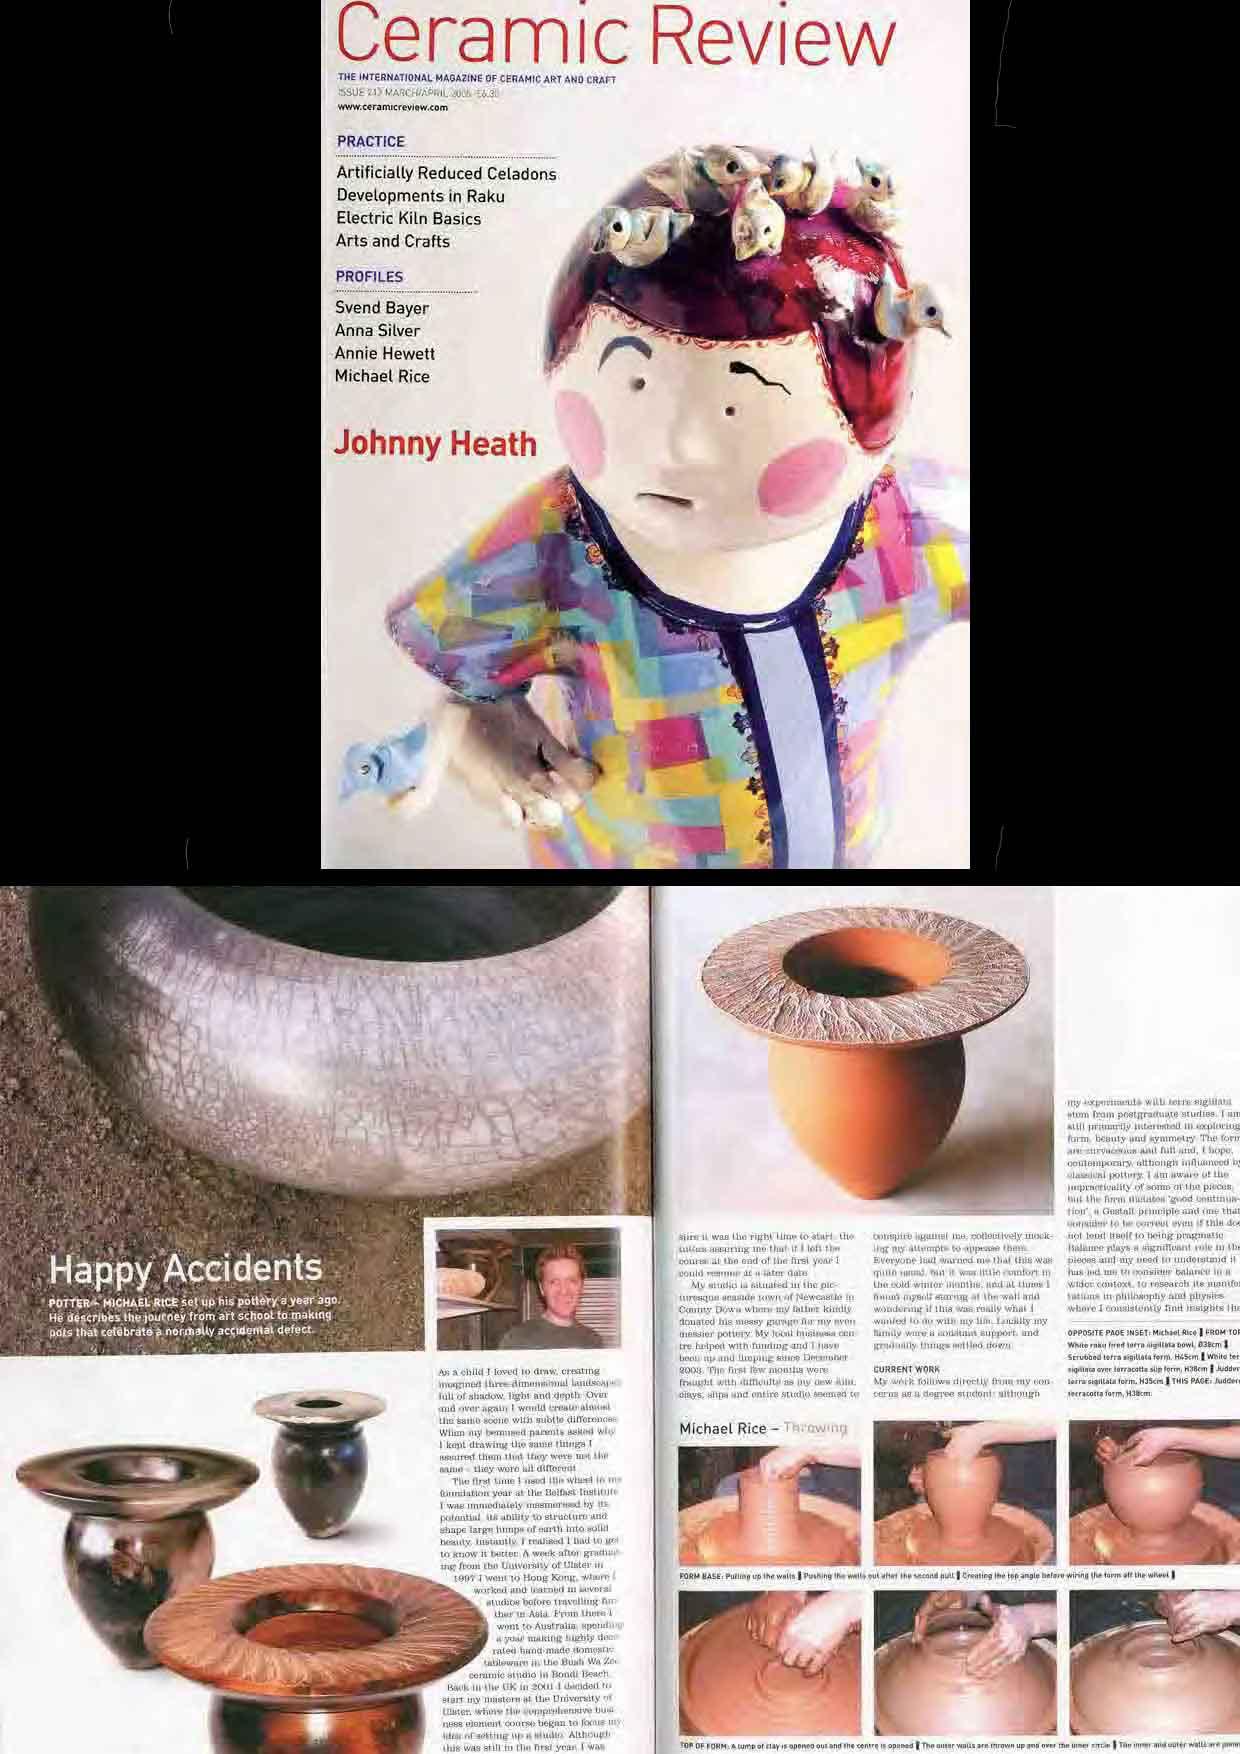 Ceramic Review Article 2006